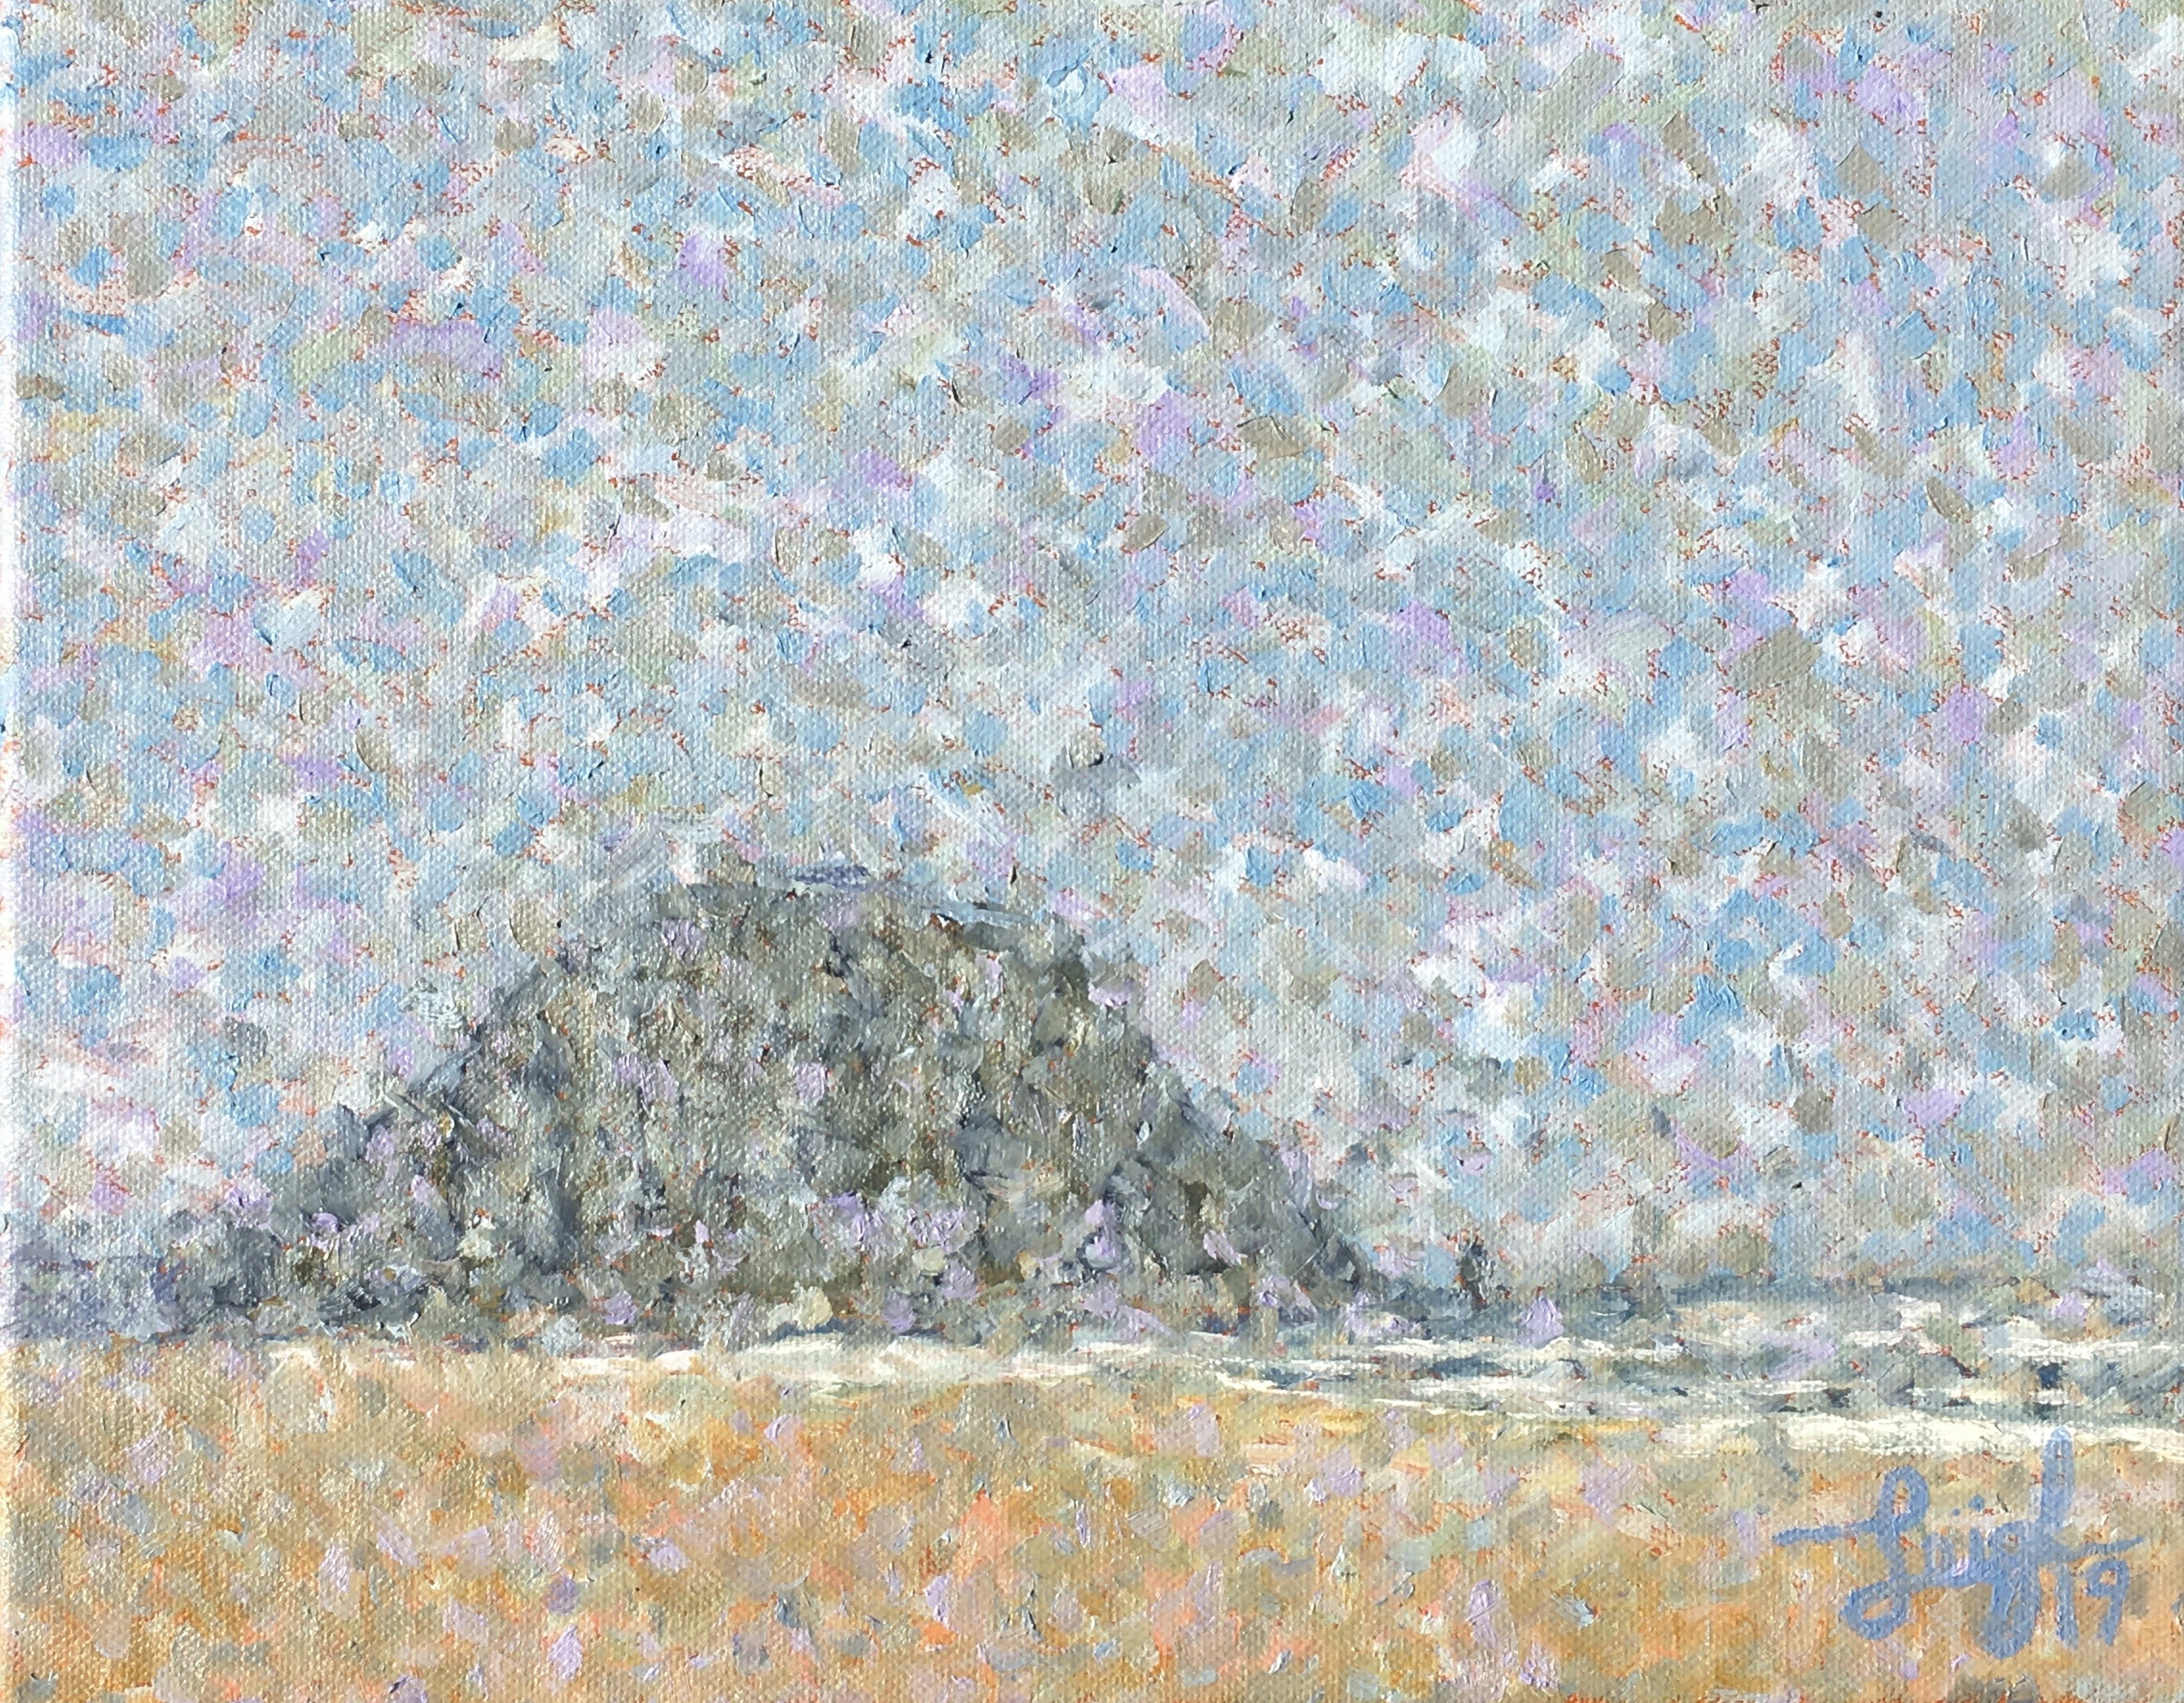 Morro Rock Series #2 (Fog Effect) 2019  •  14 x 11